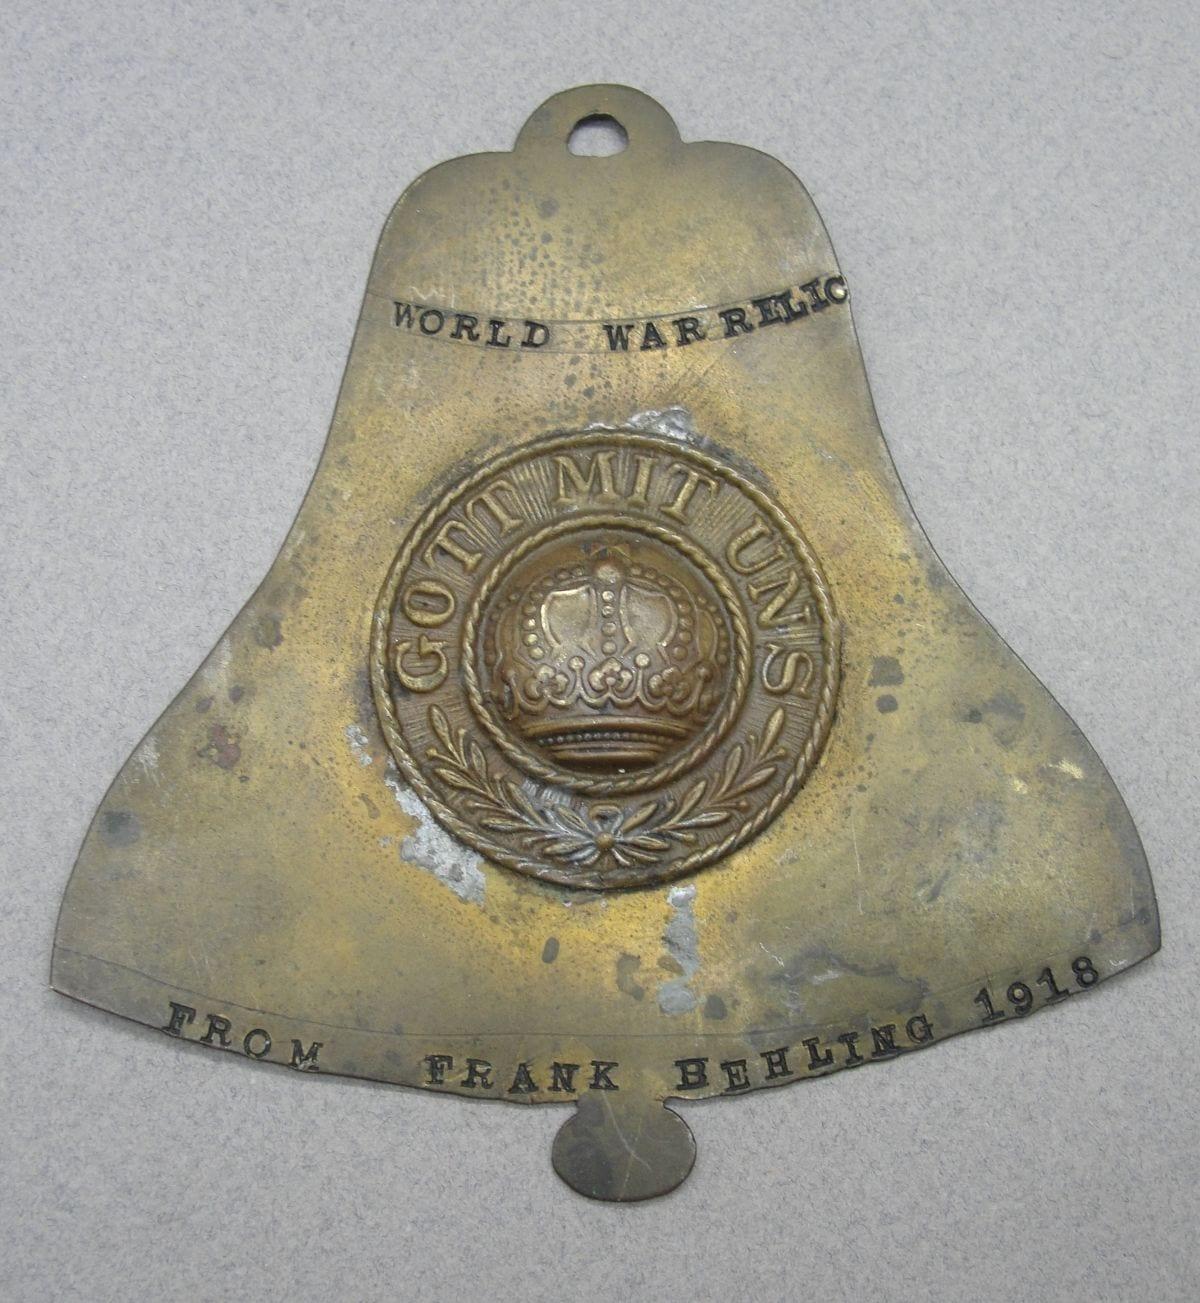 1918 World War Relic --- German Belt Buckle Center Soldier Art